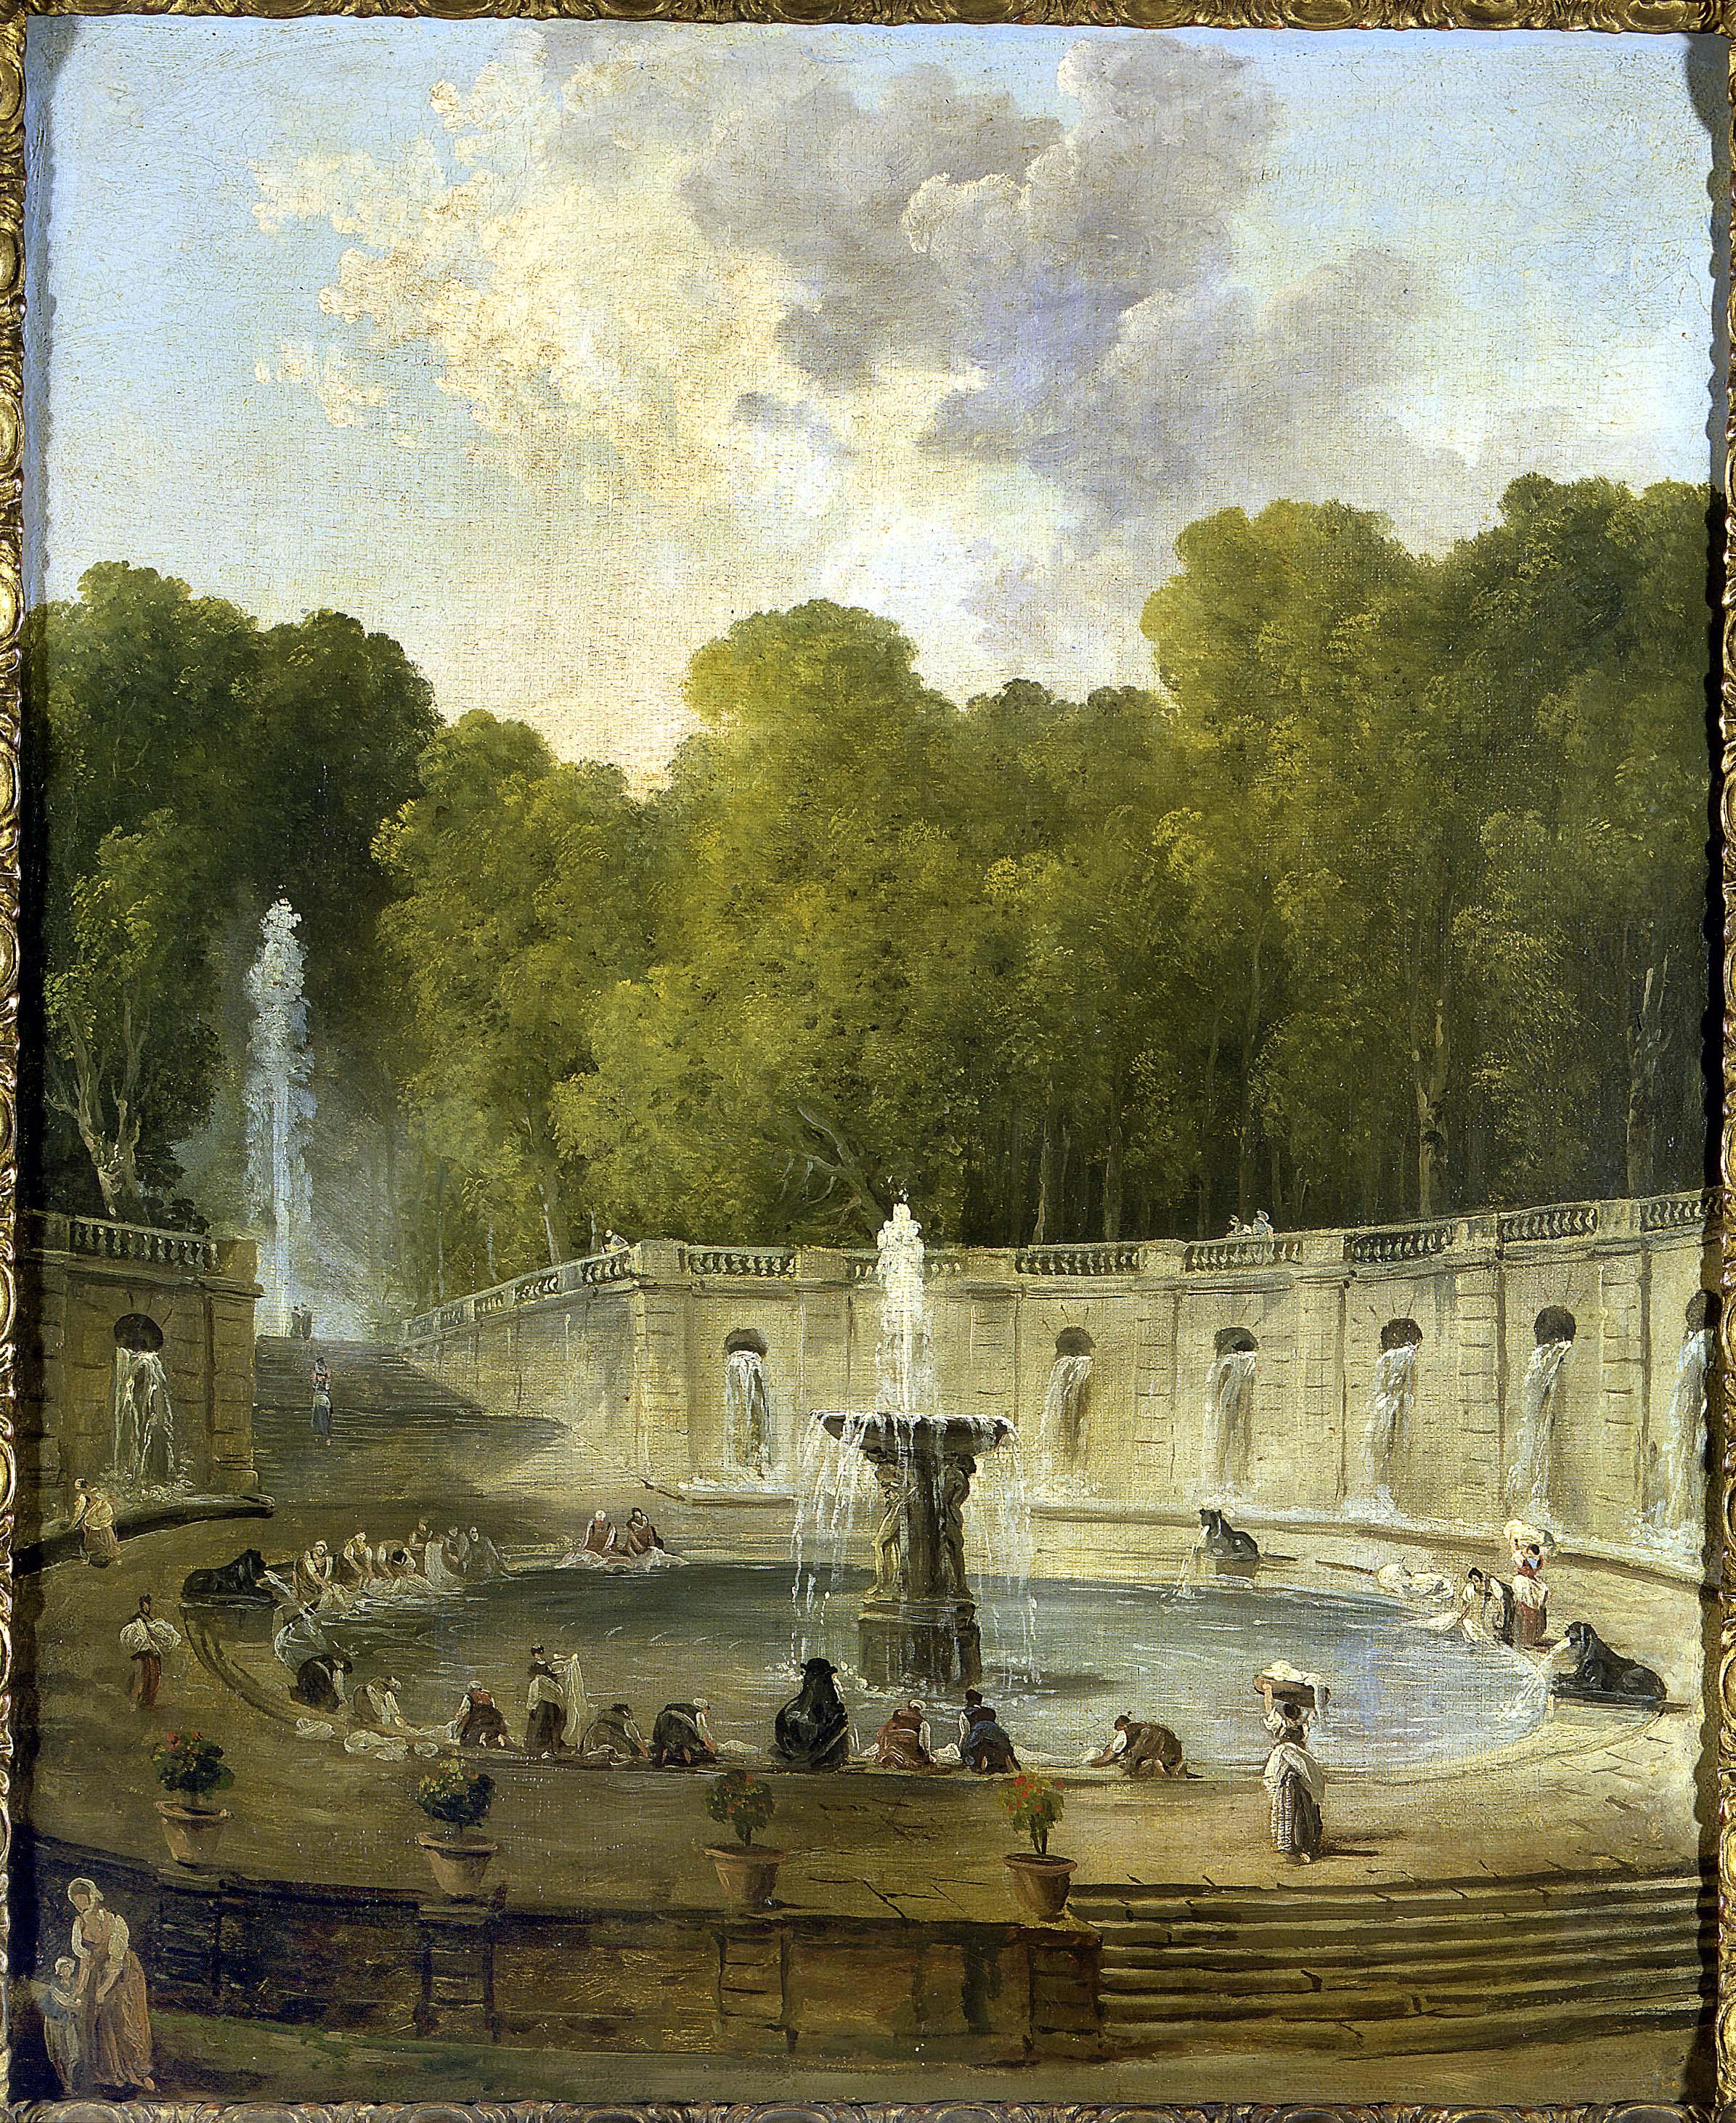 Hubert Robert - Lavandières dans un parc